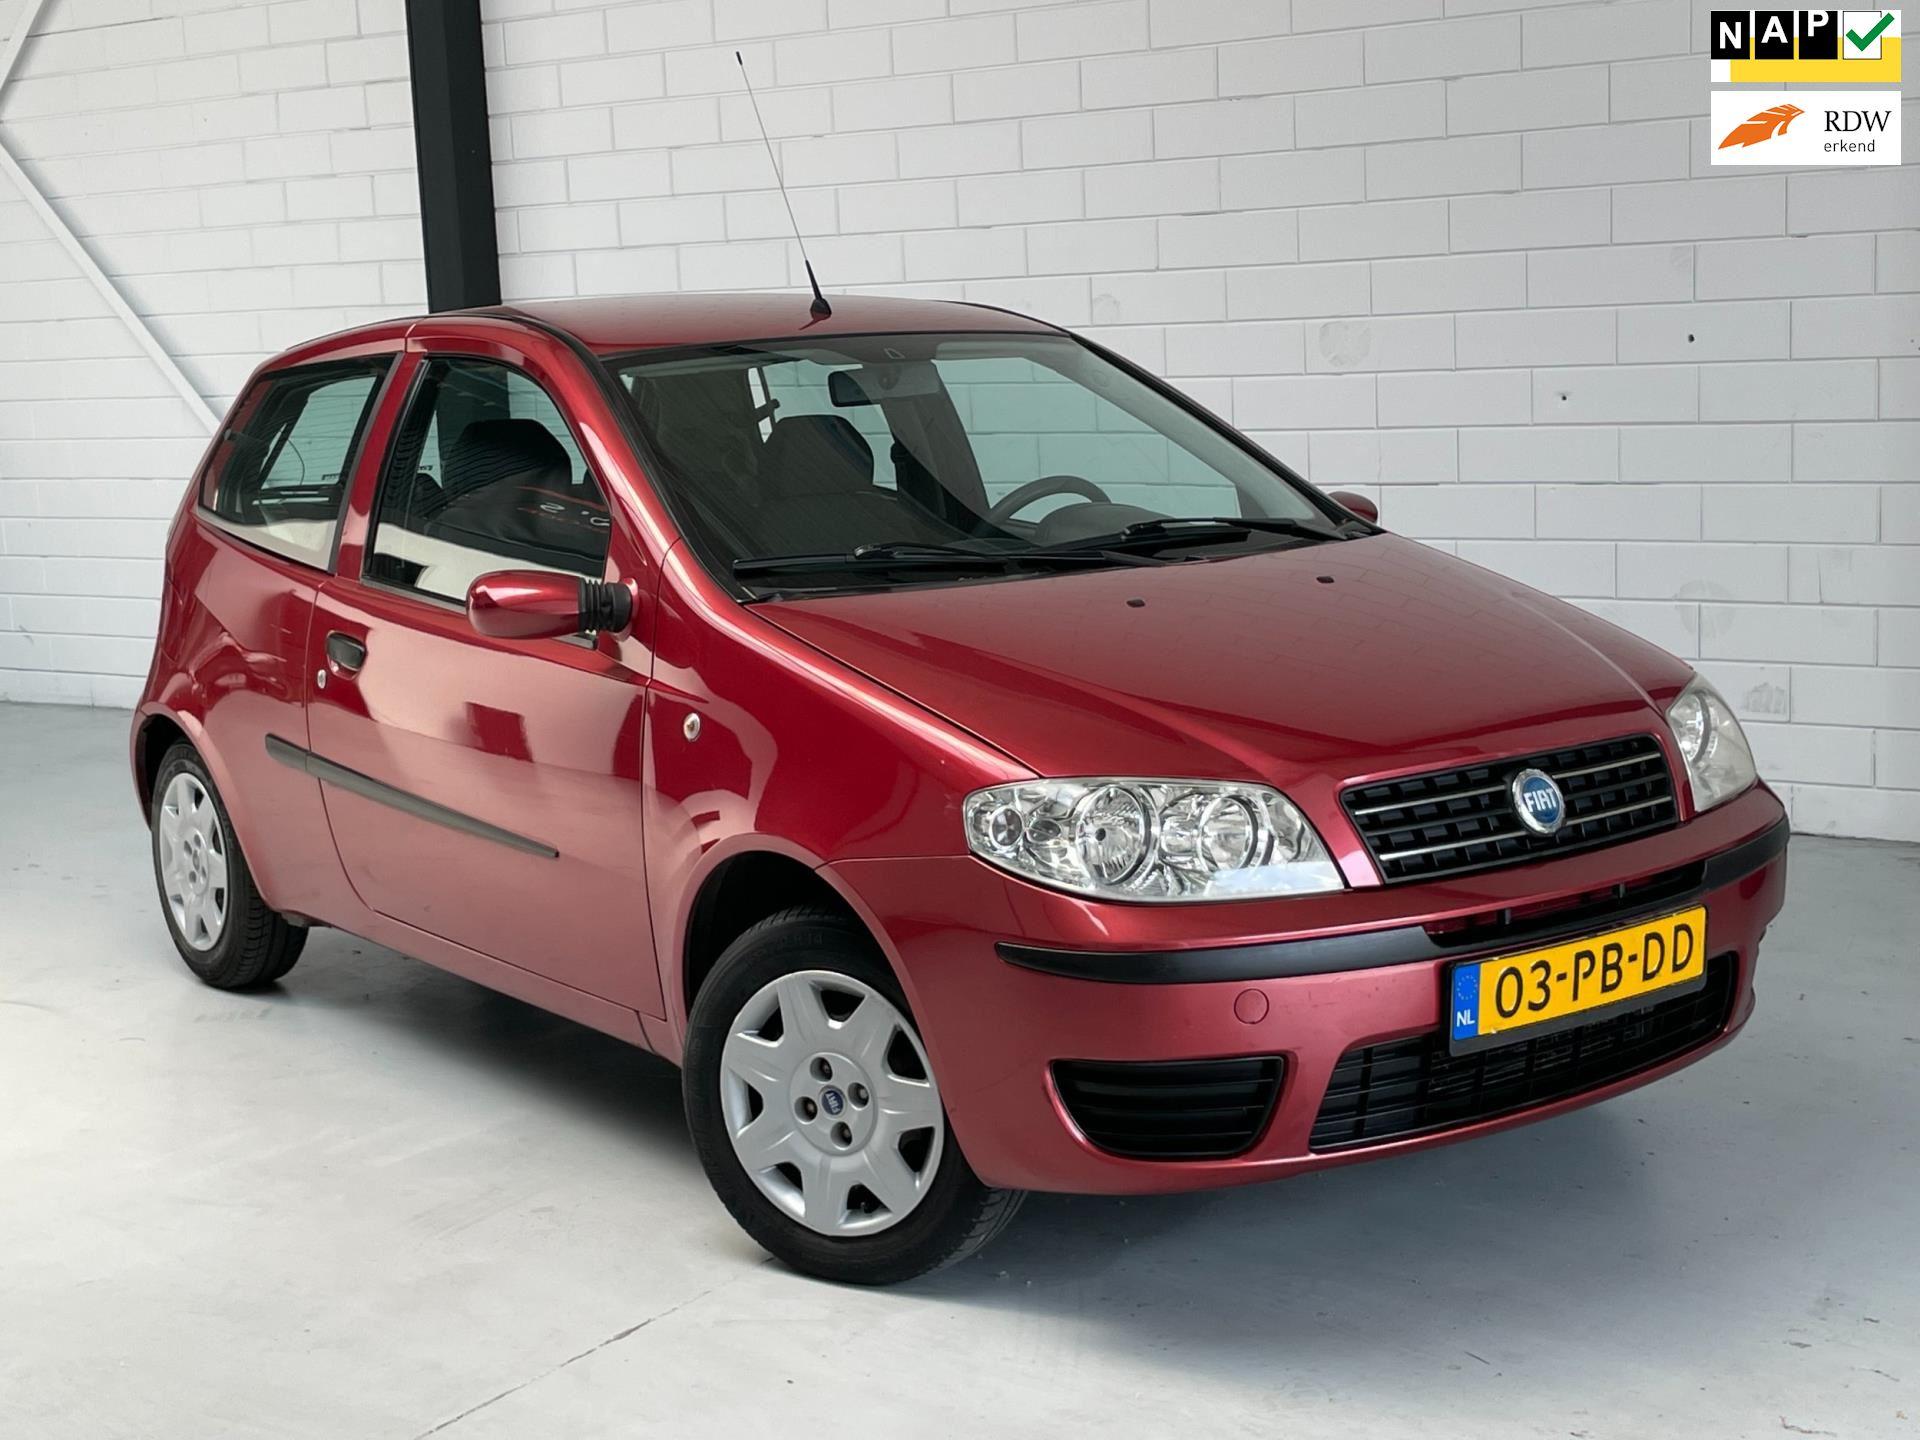 Fiat Punto occasion - Lap Auto's